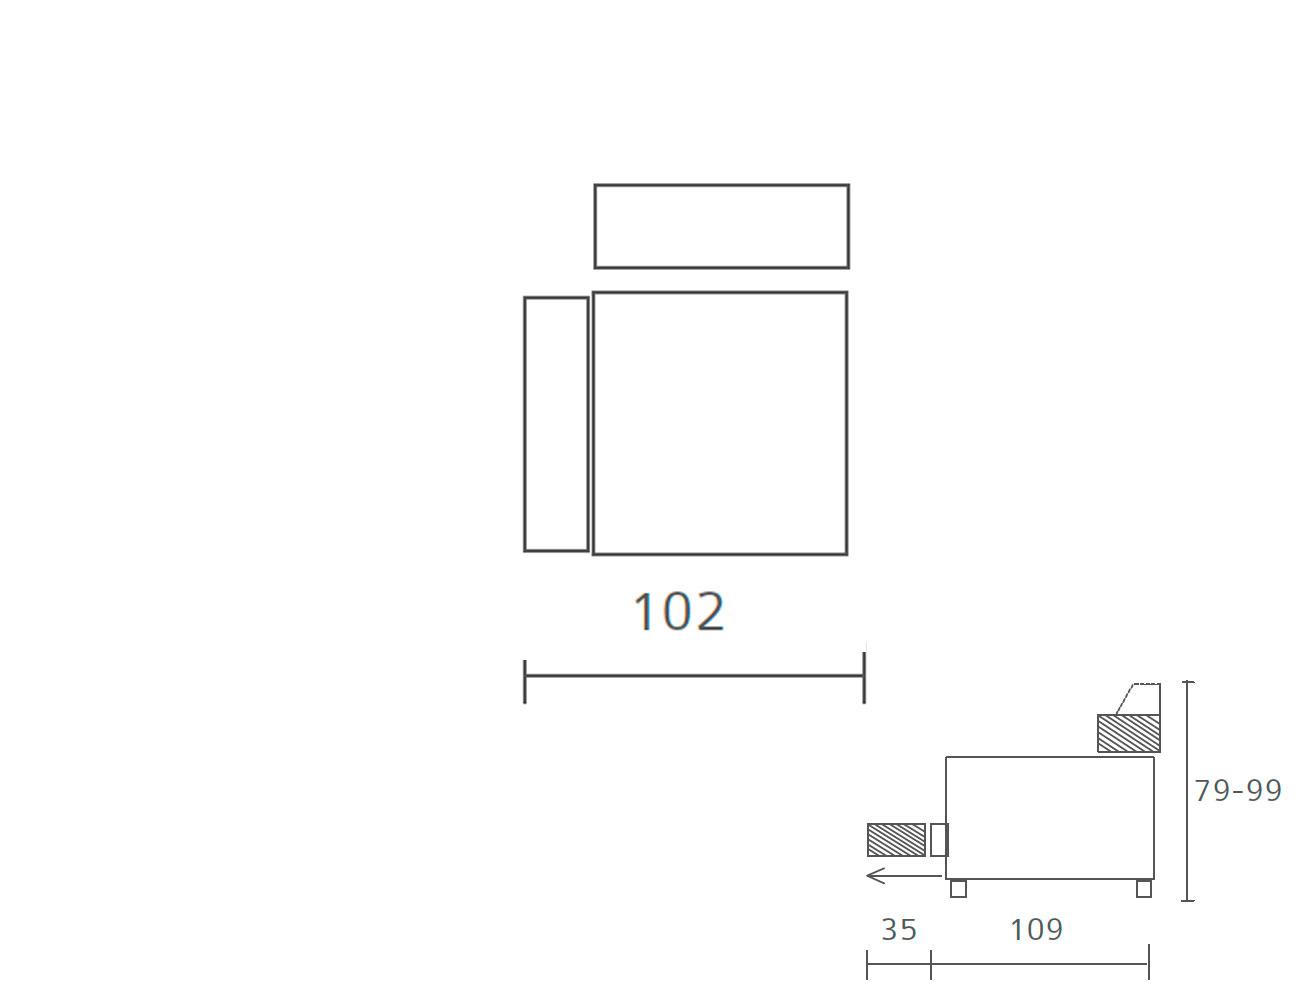 Sofa piel 1 plaza 1025